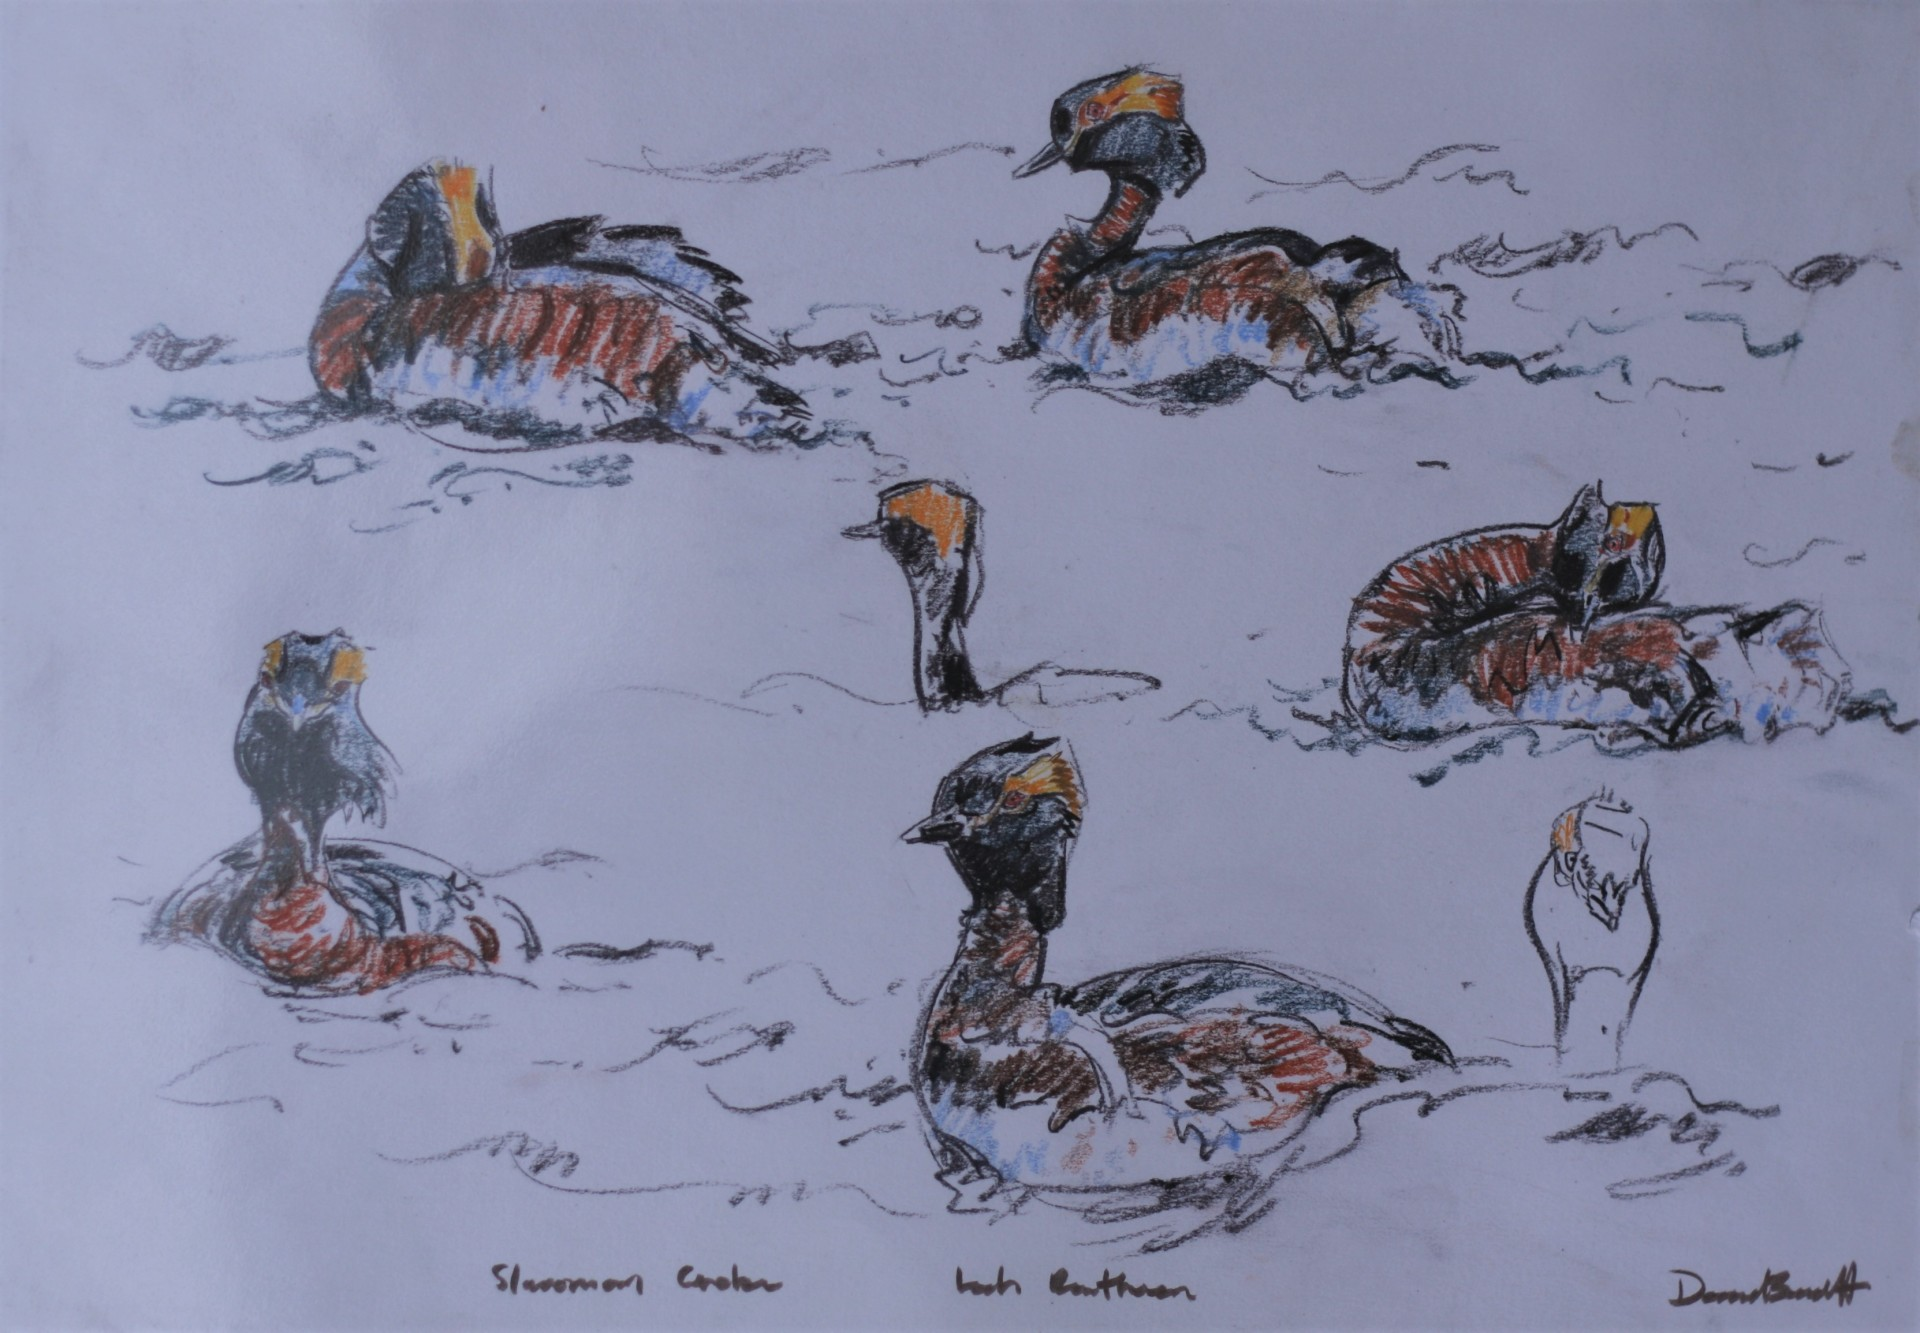 Slavonion Grebe Studies, Loch Ruthven, Highlands